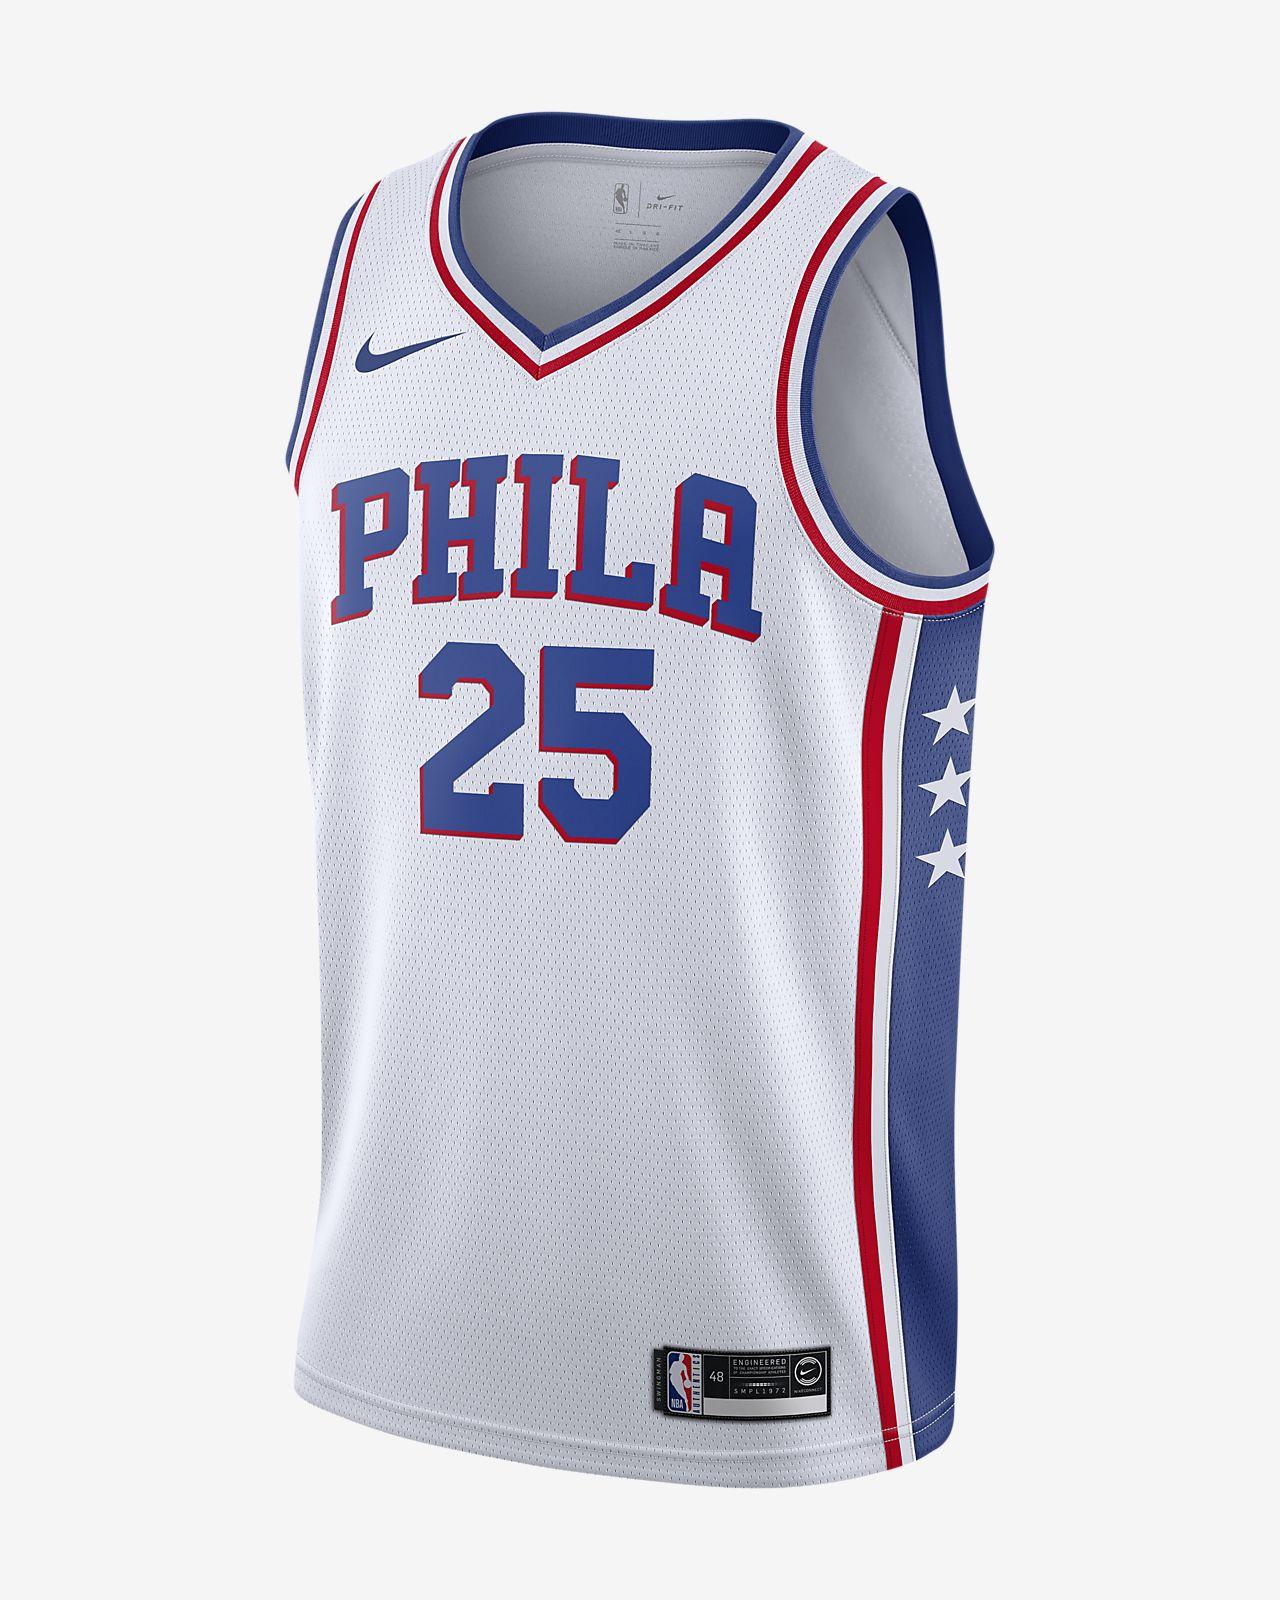 Maillot Nike NBA Swingman Ben Simmons 76ers Association Edition